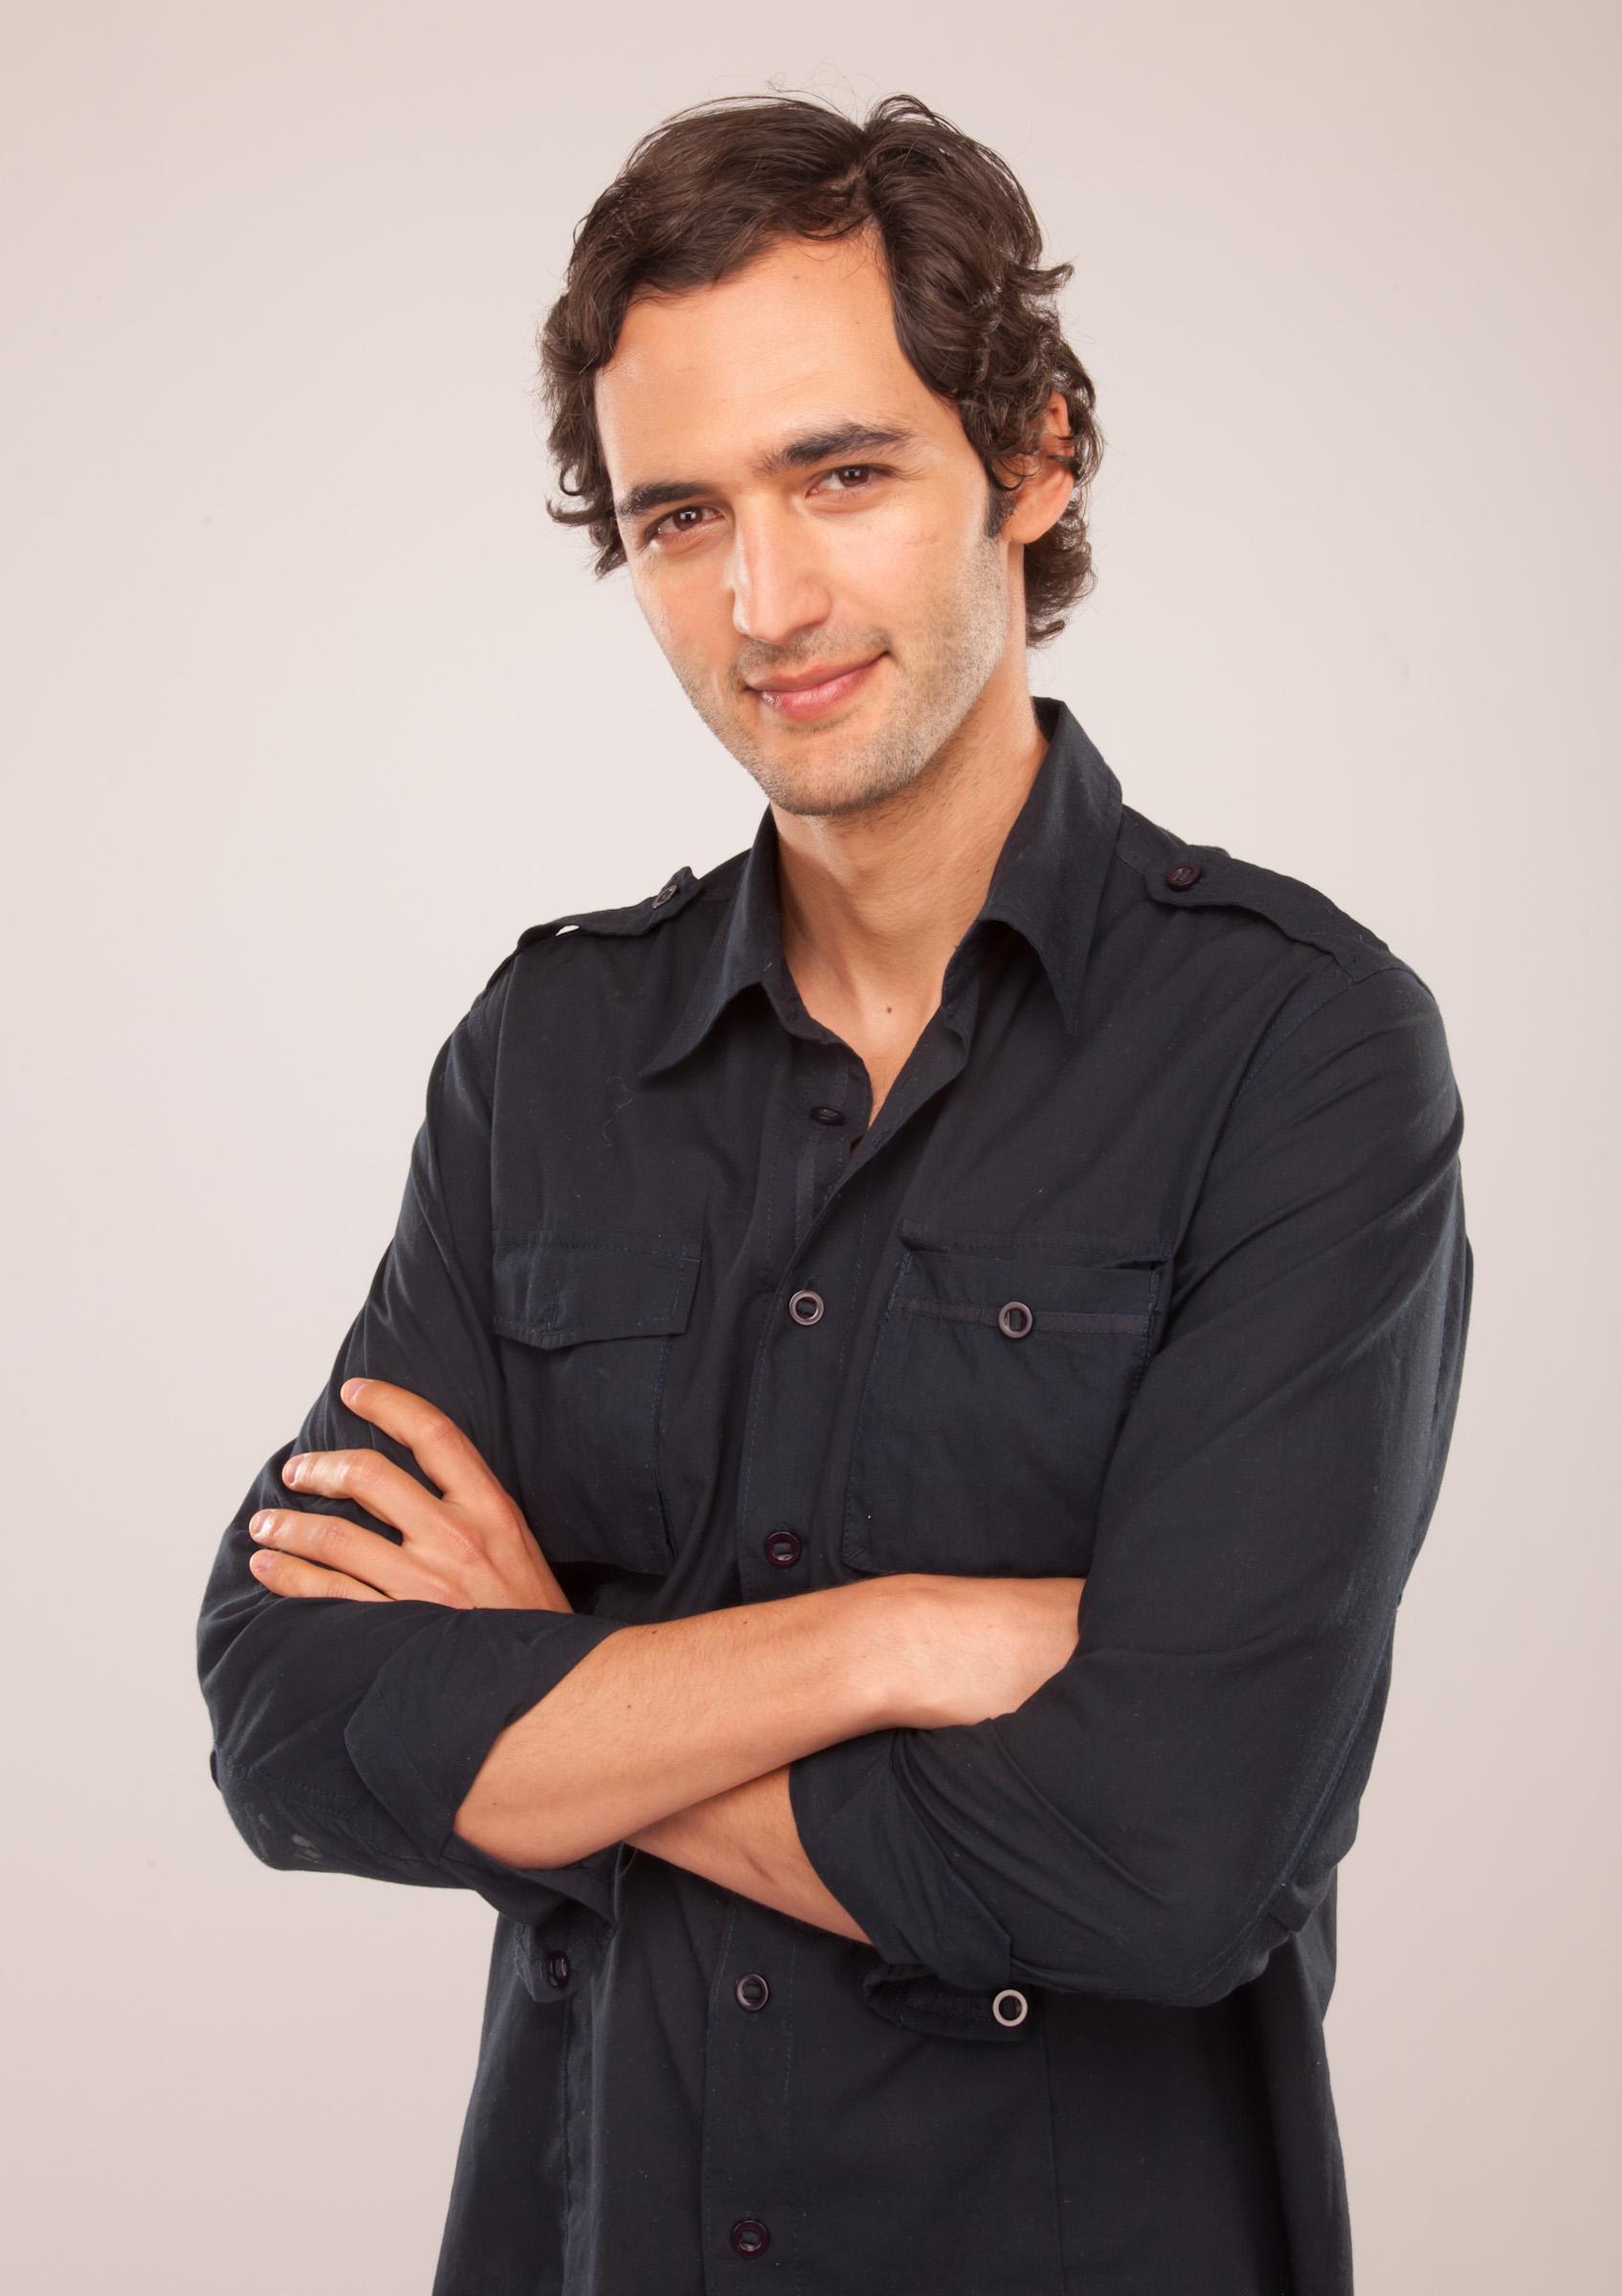 Jason Silva, Host of Brain Games